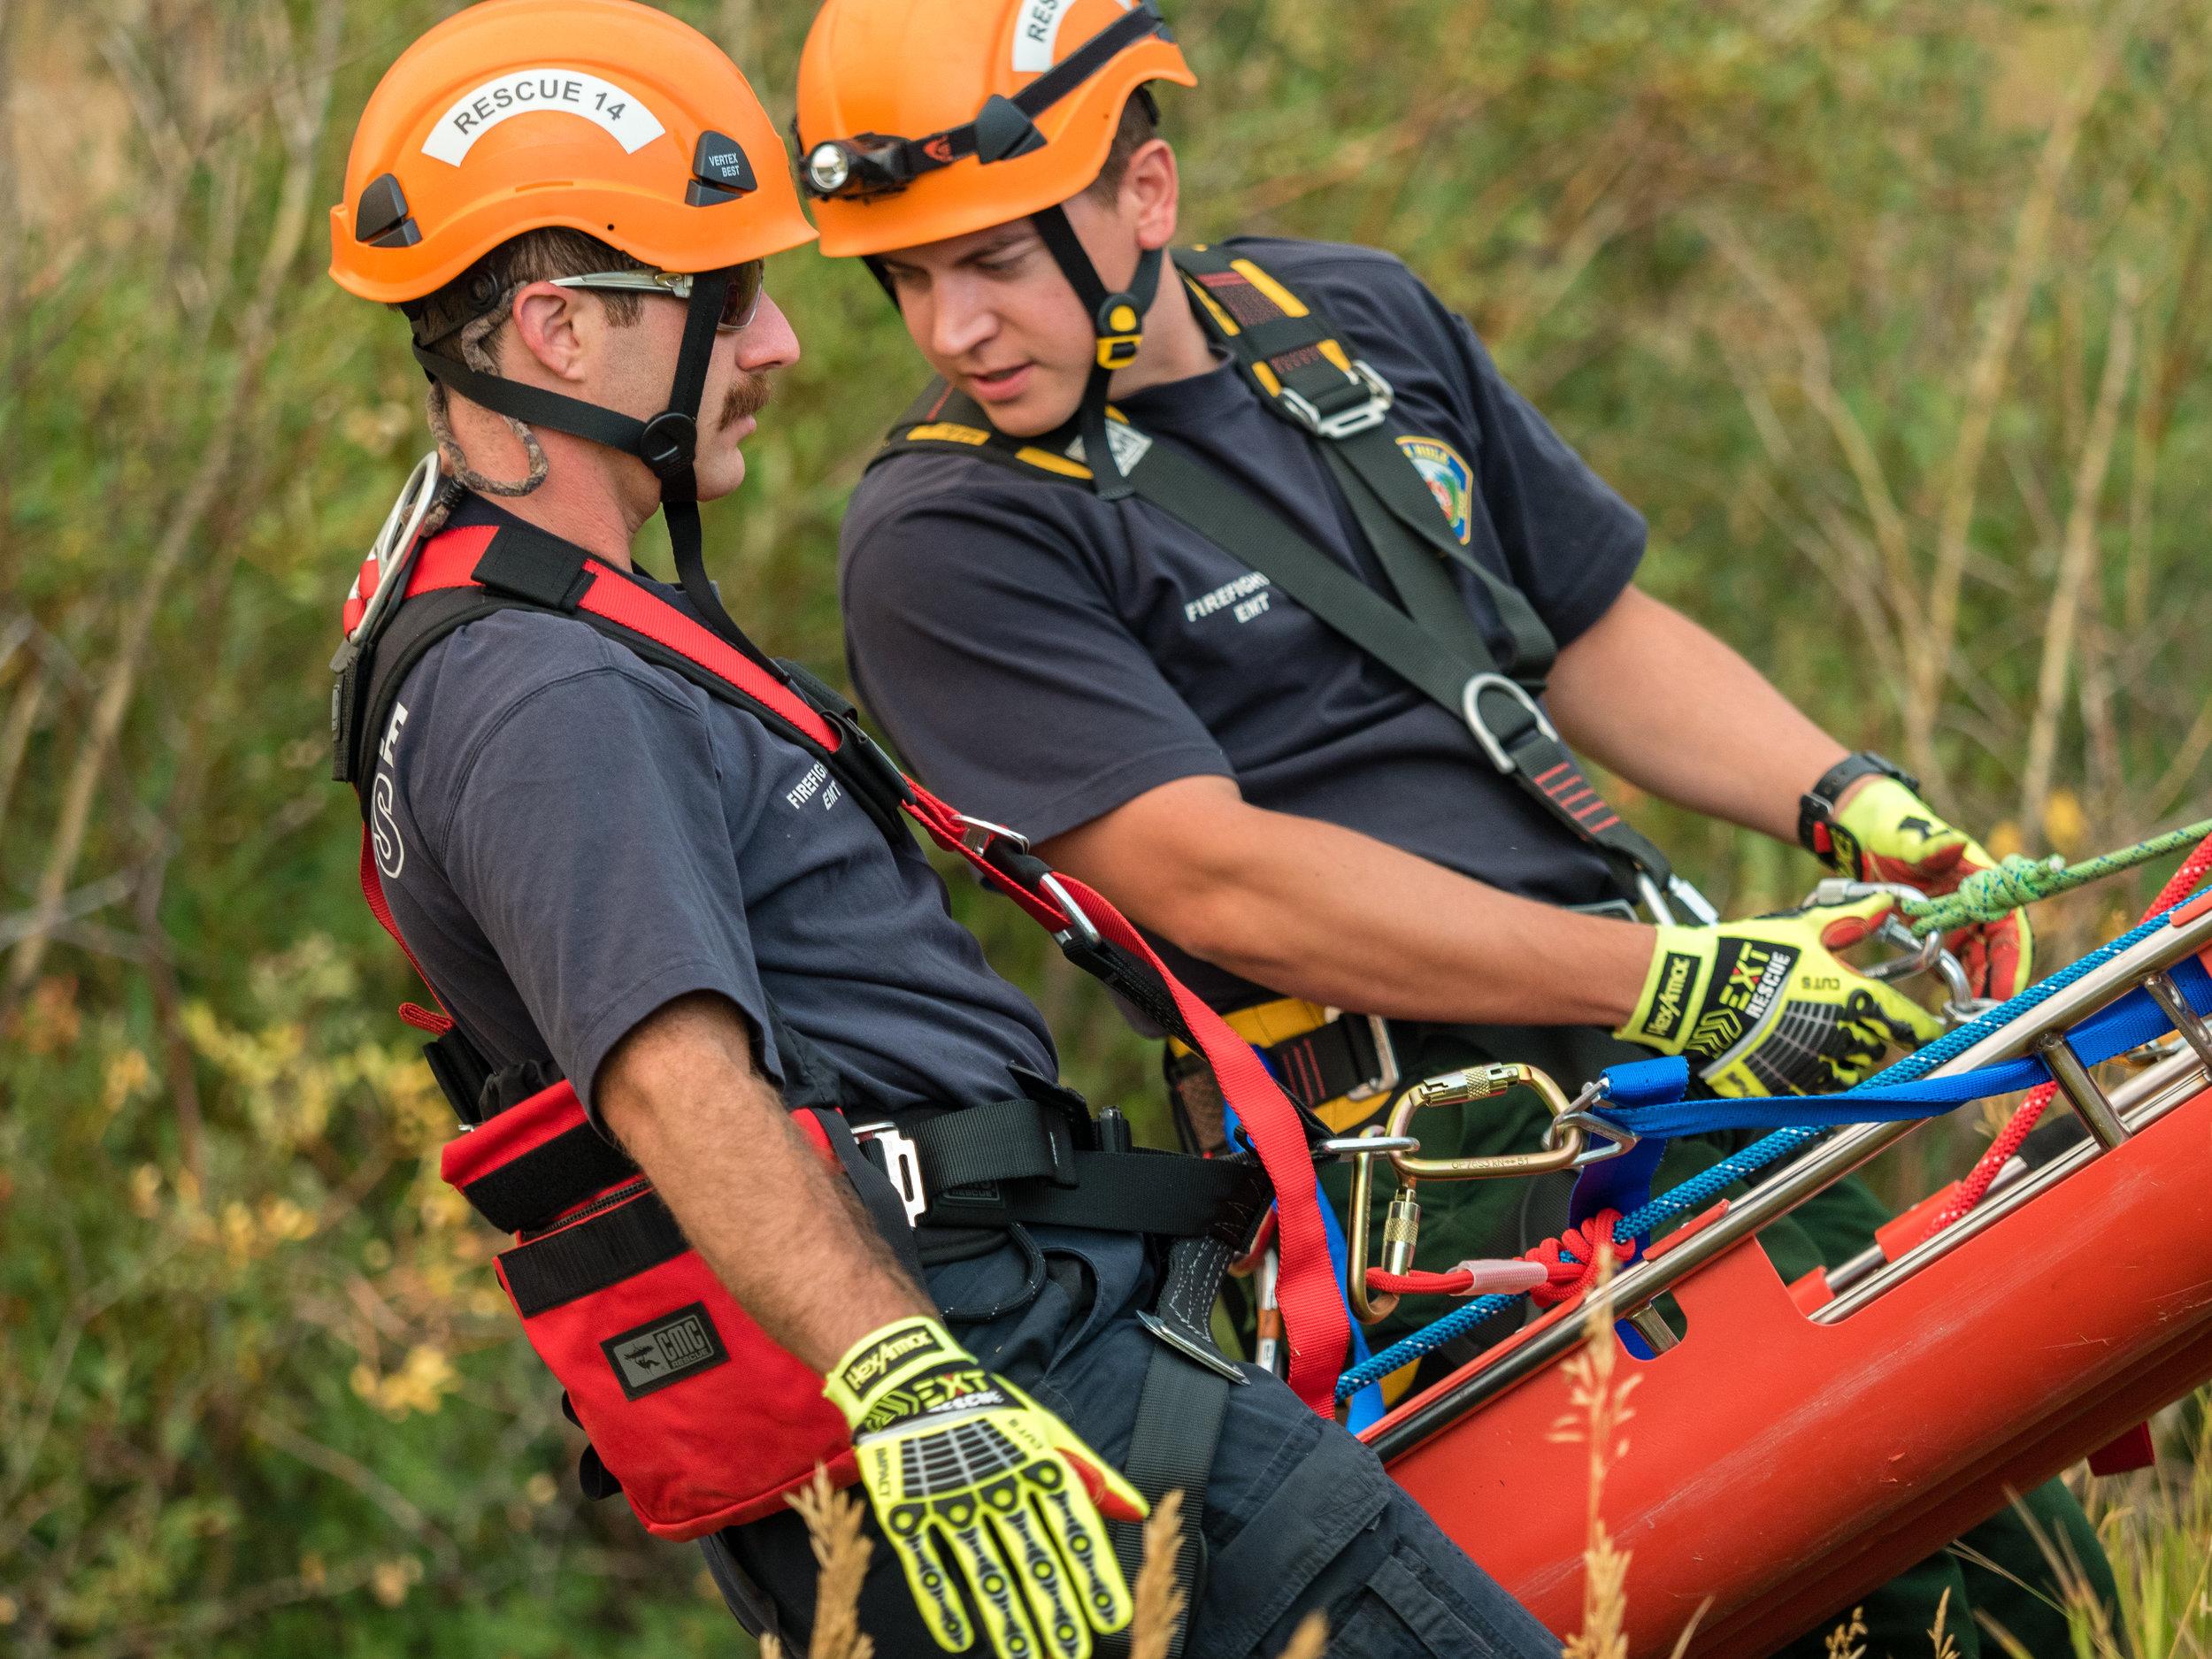 Steep Angle Rescue